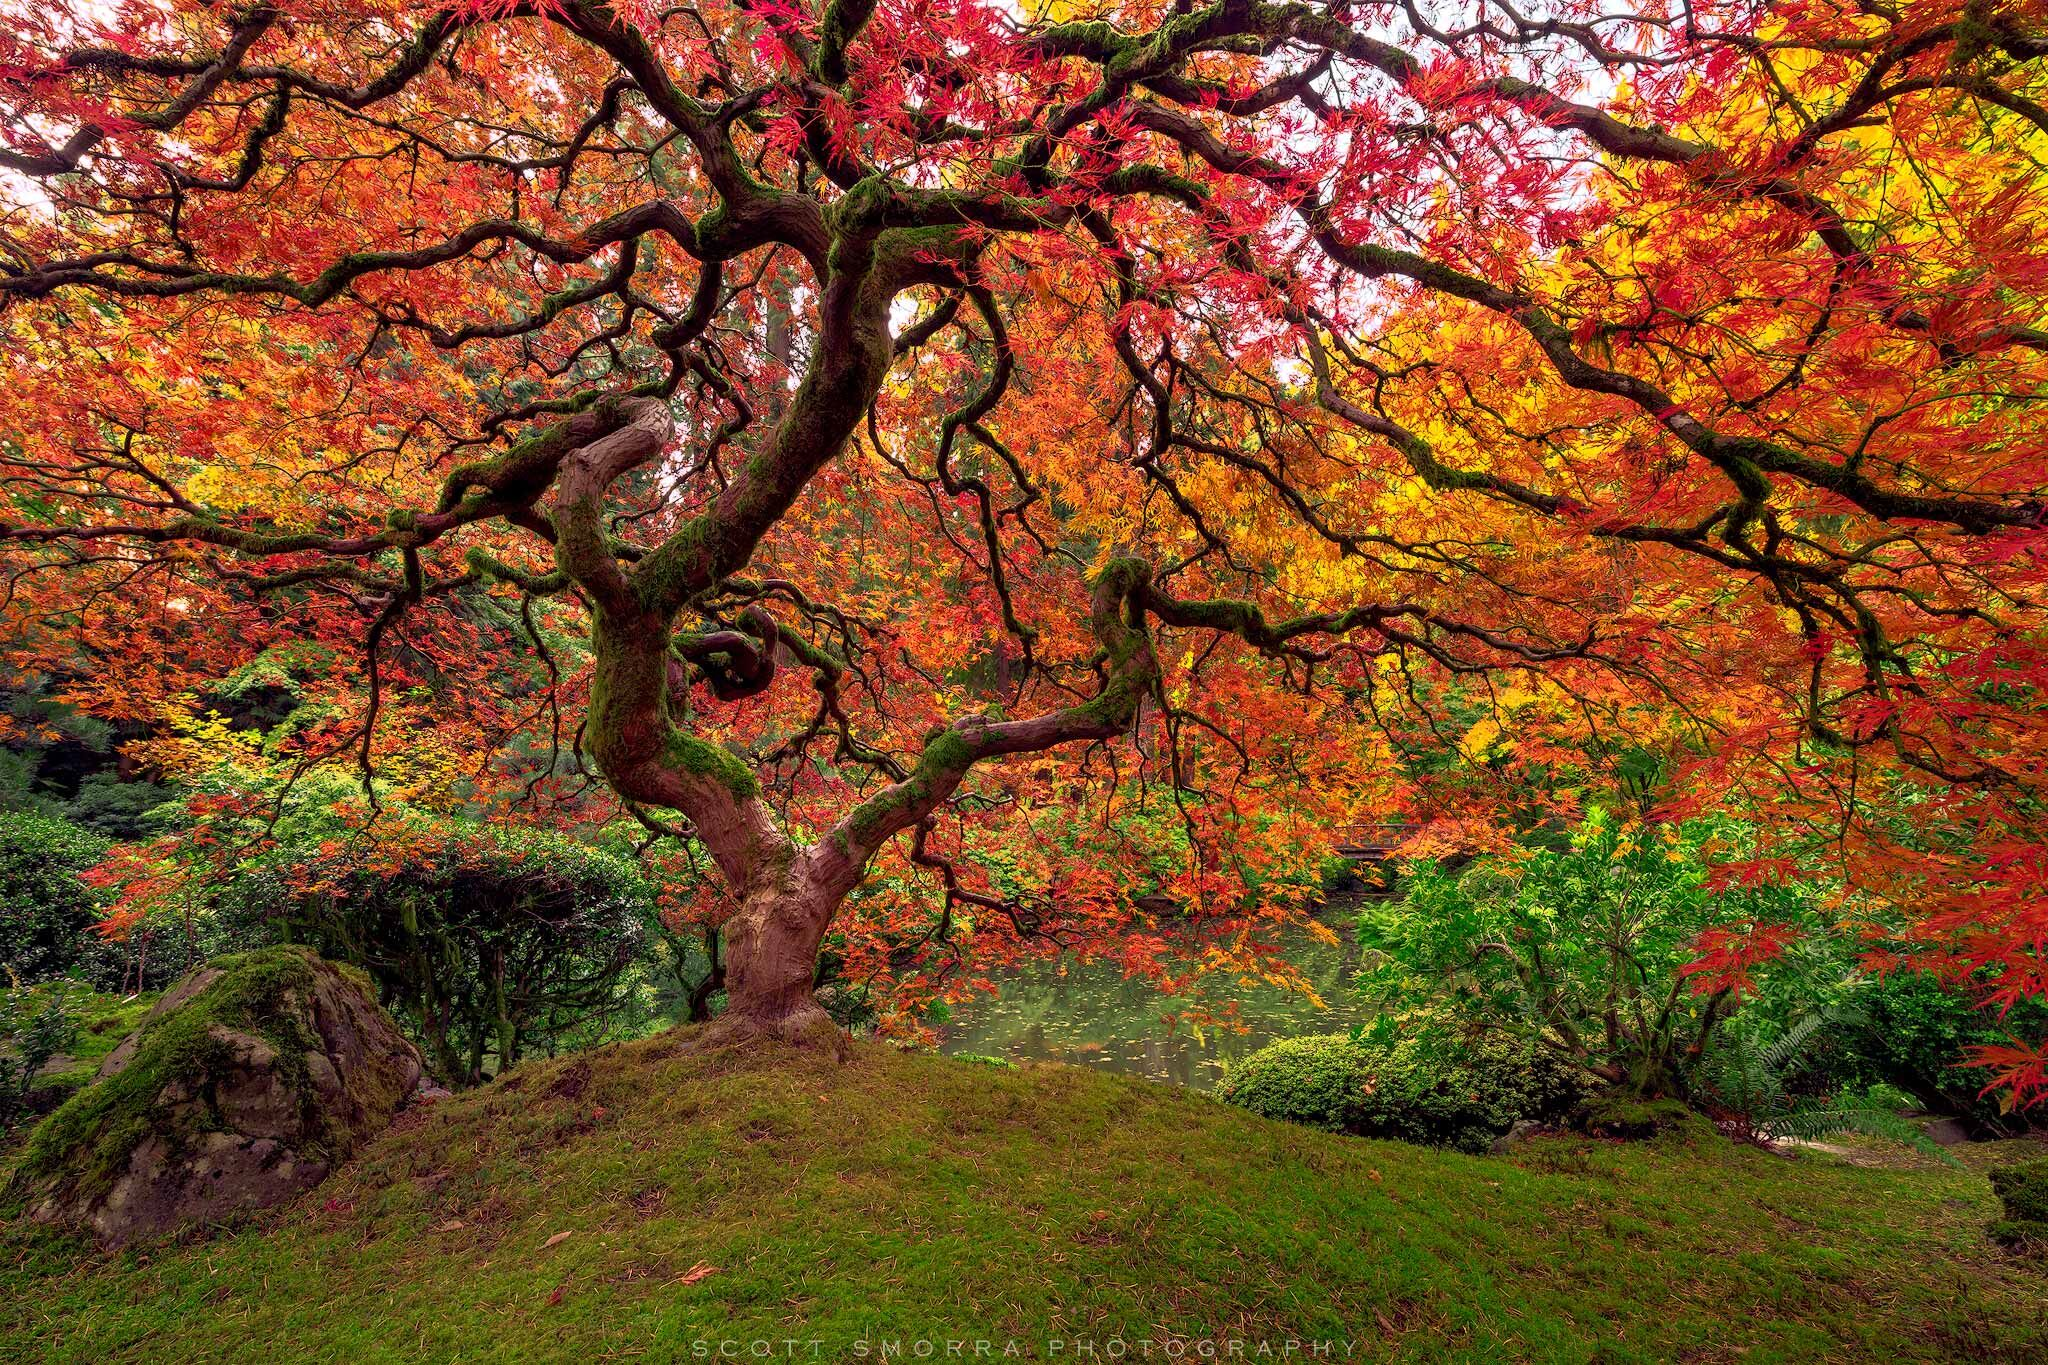 Portland, Japanese, Garden, Fall, Tree, Maple, Famous, Leaves, Autumn, photo